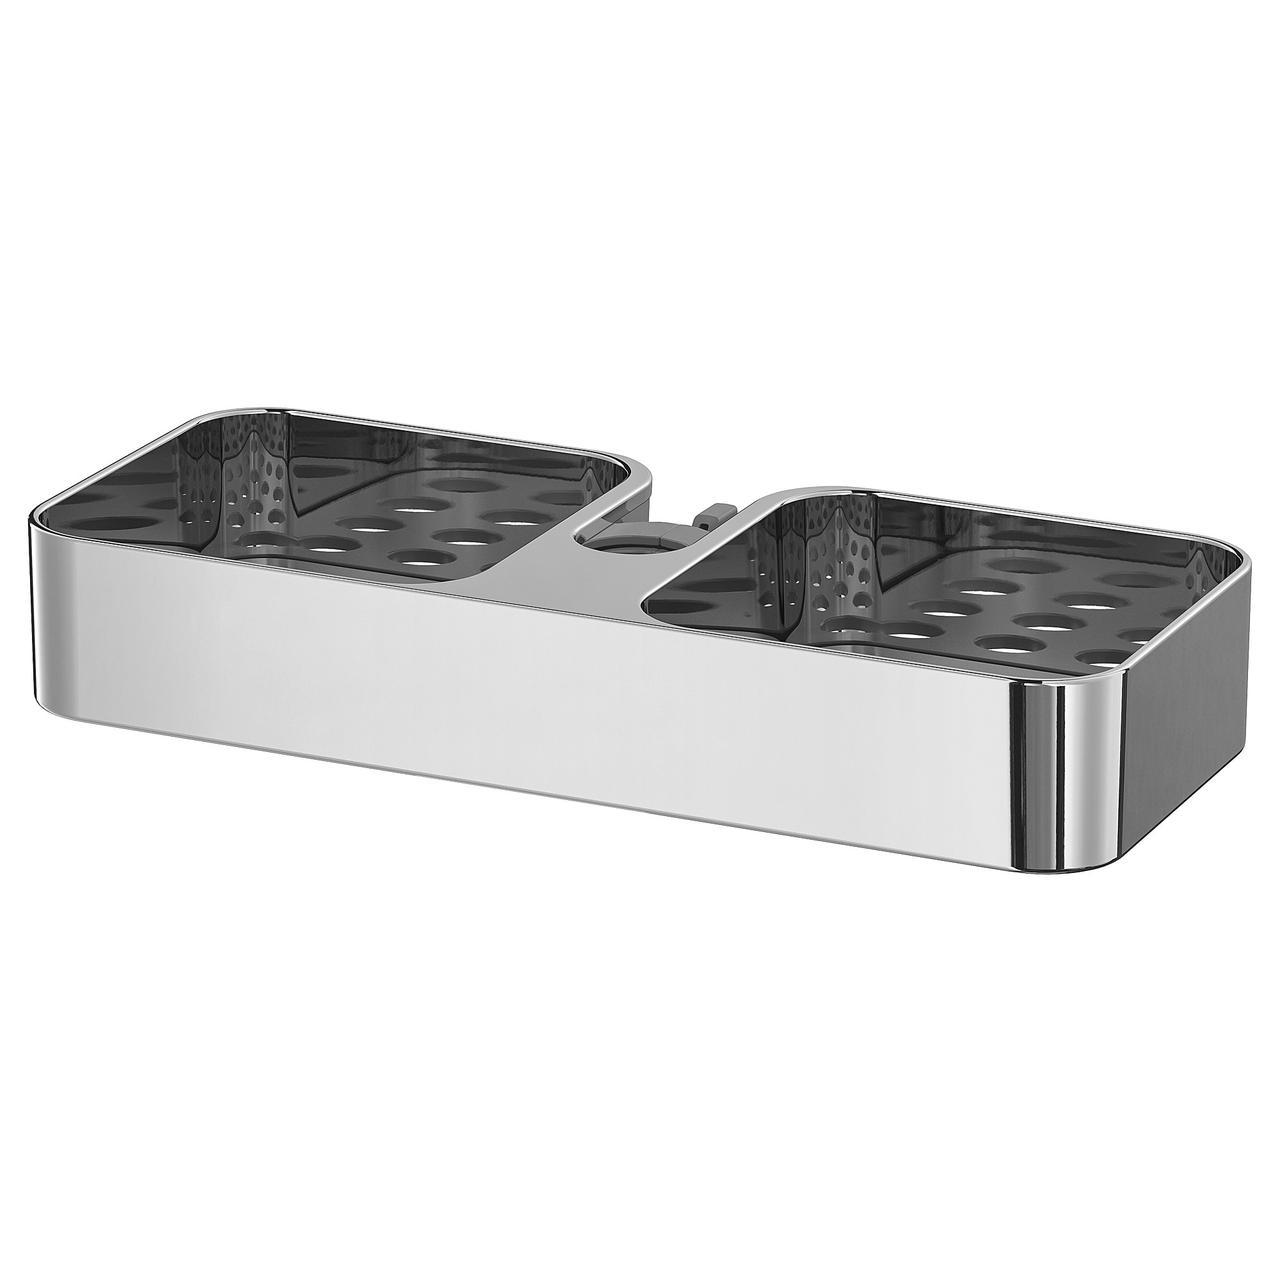 Полка для душа IKEA BROGRUND 25x4 см хром 903.285.26